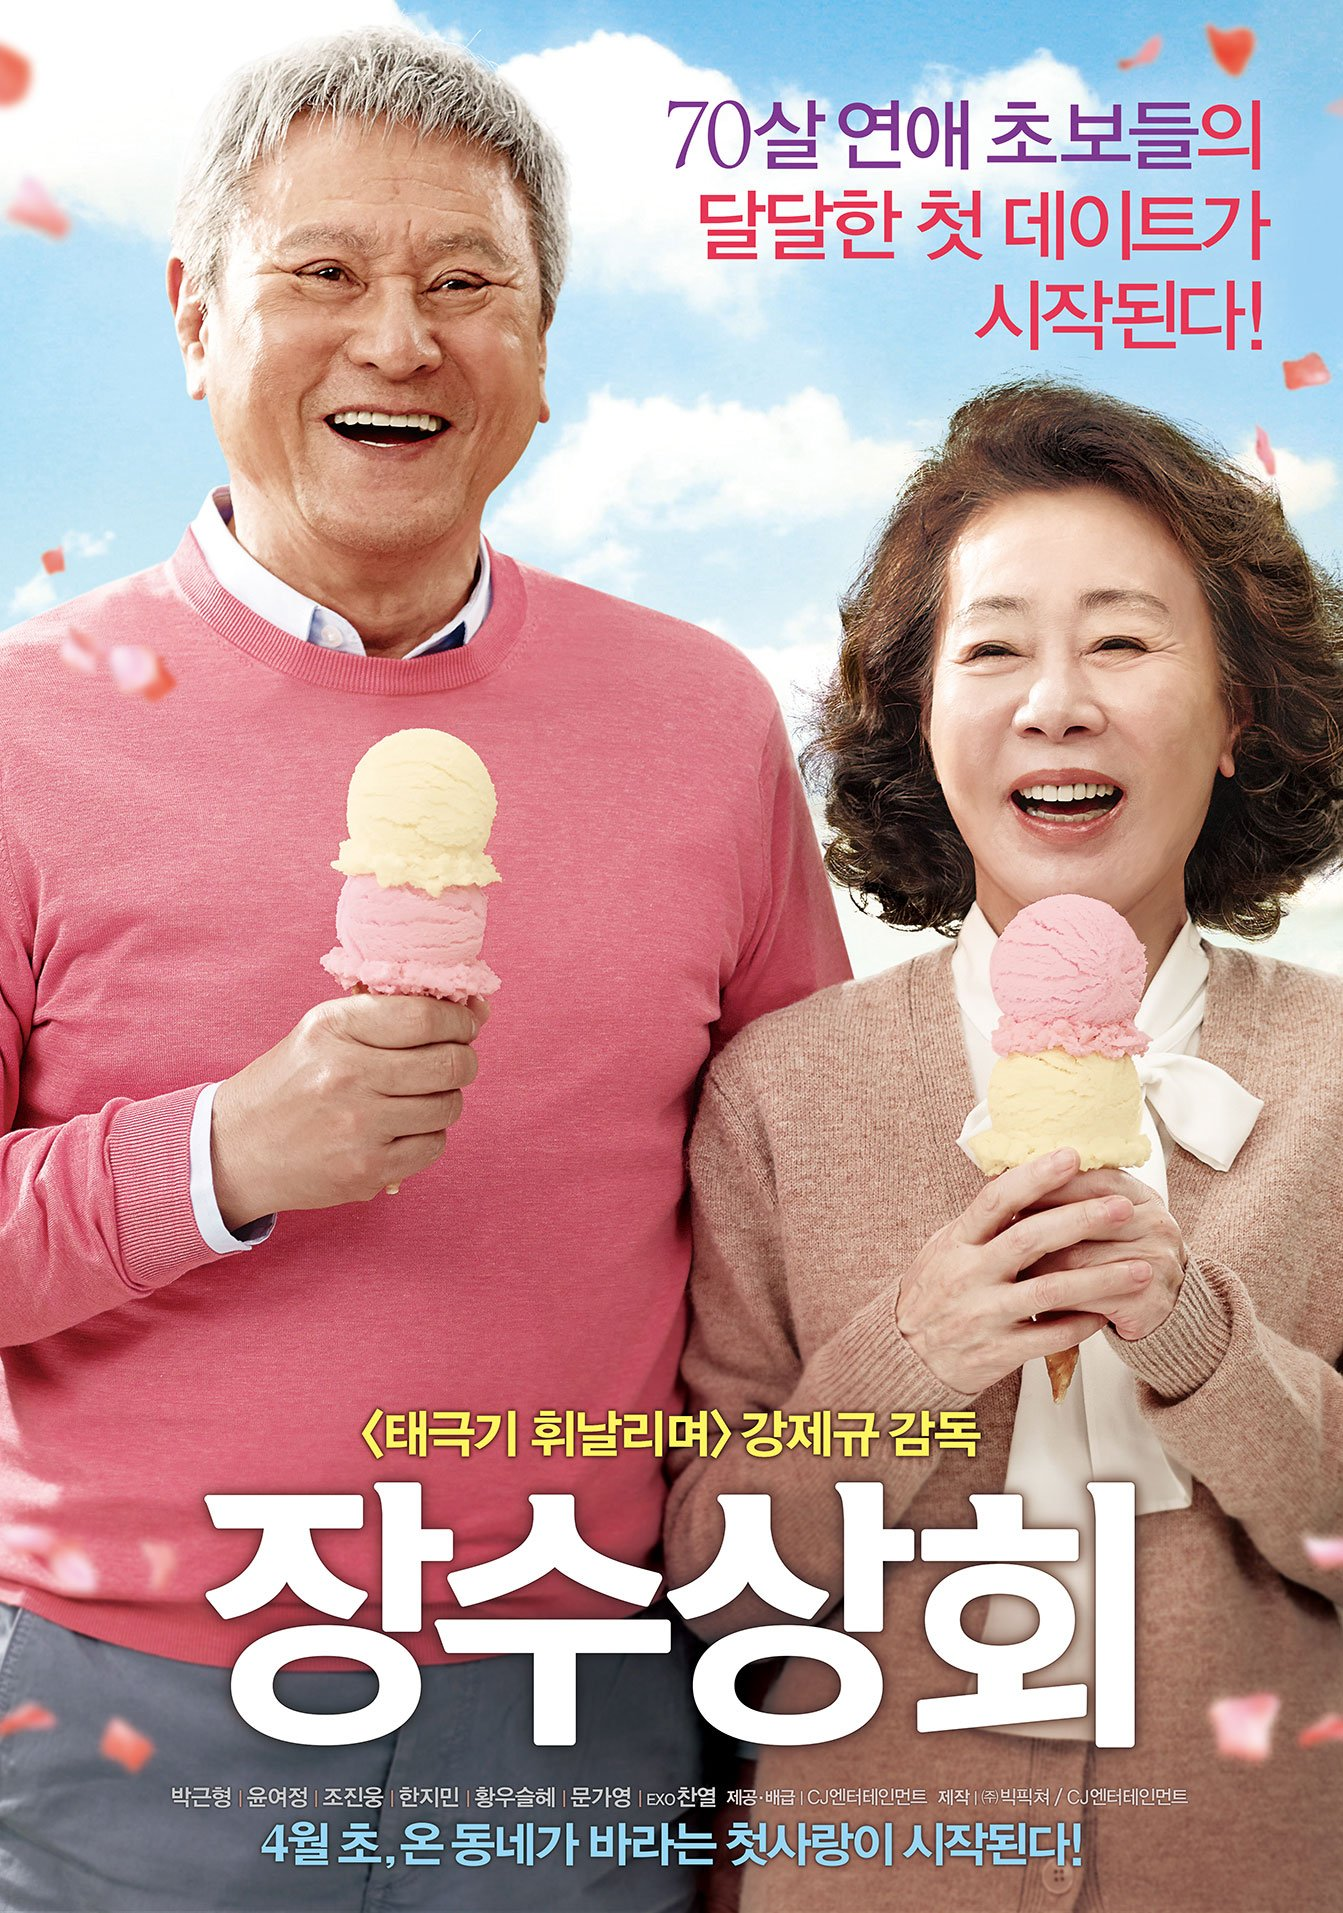 salut damour korean movie sub indo